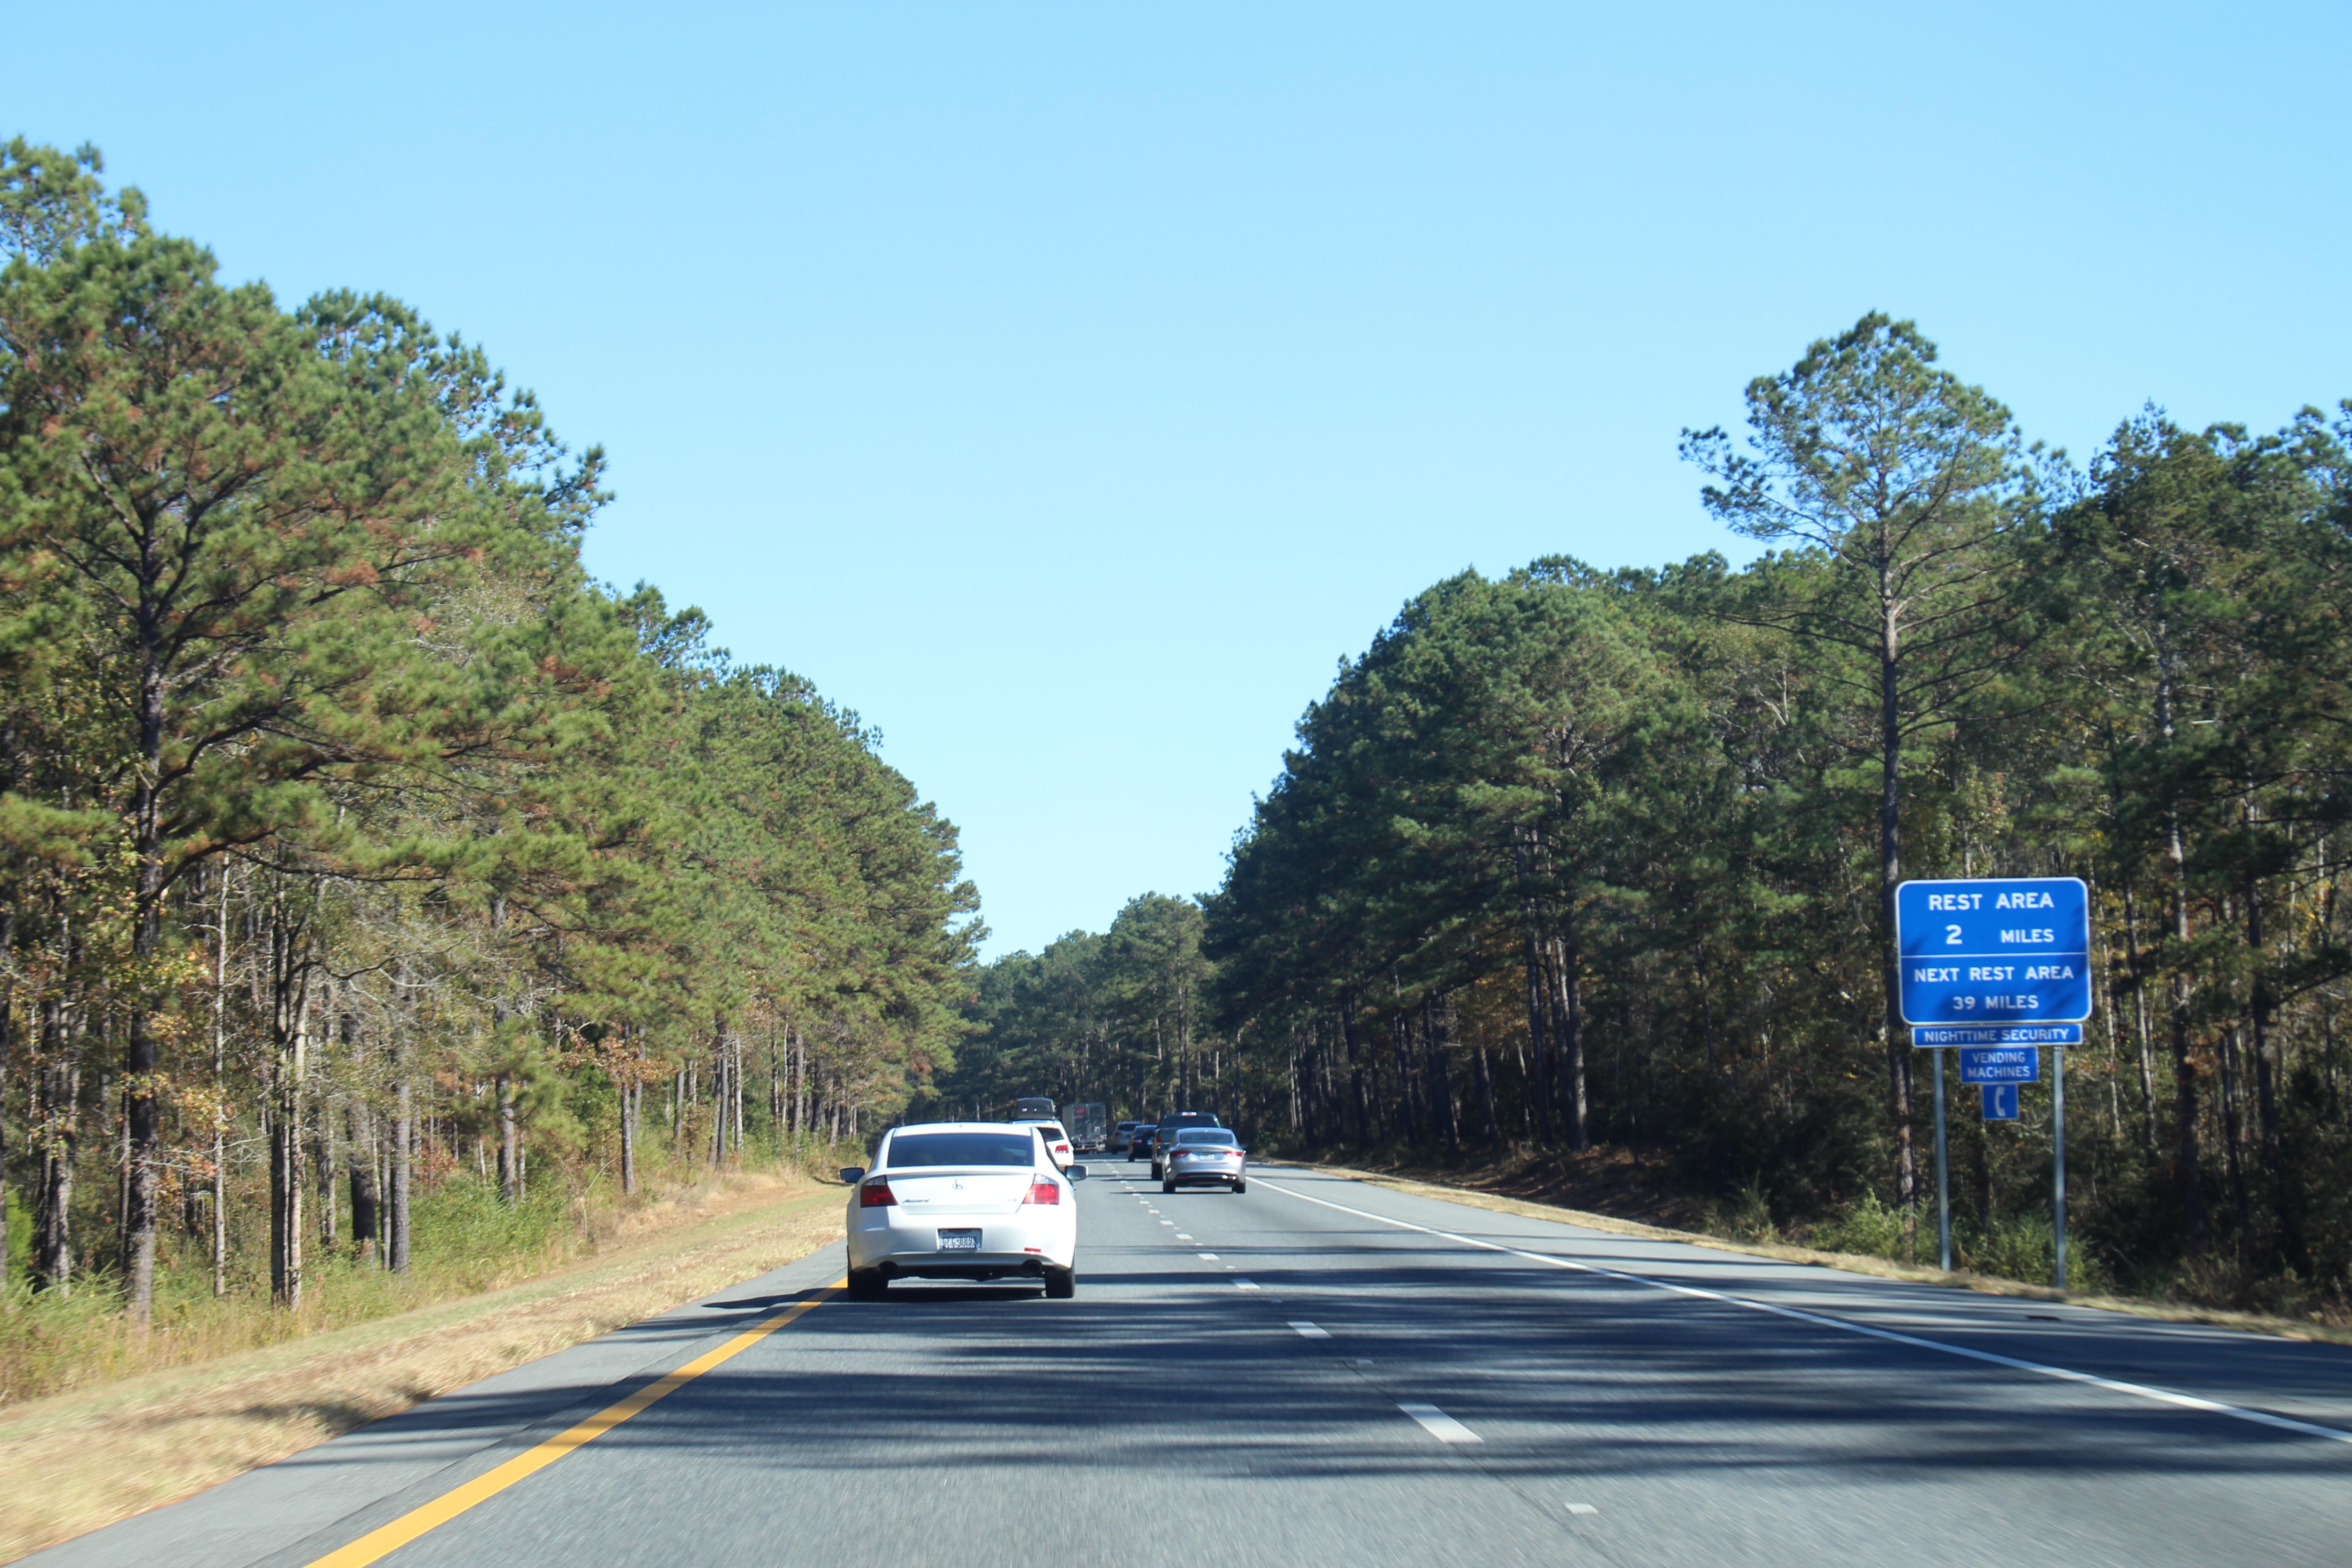 Highway 2 rest area